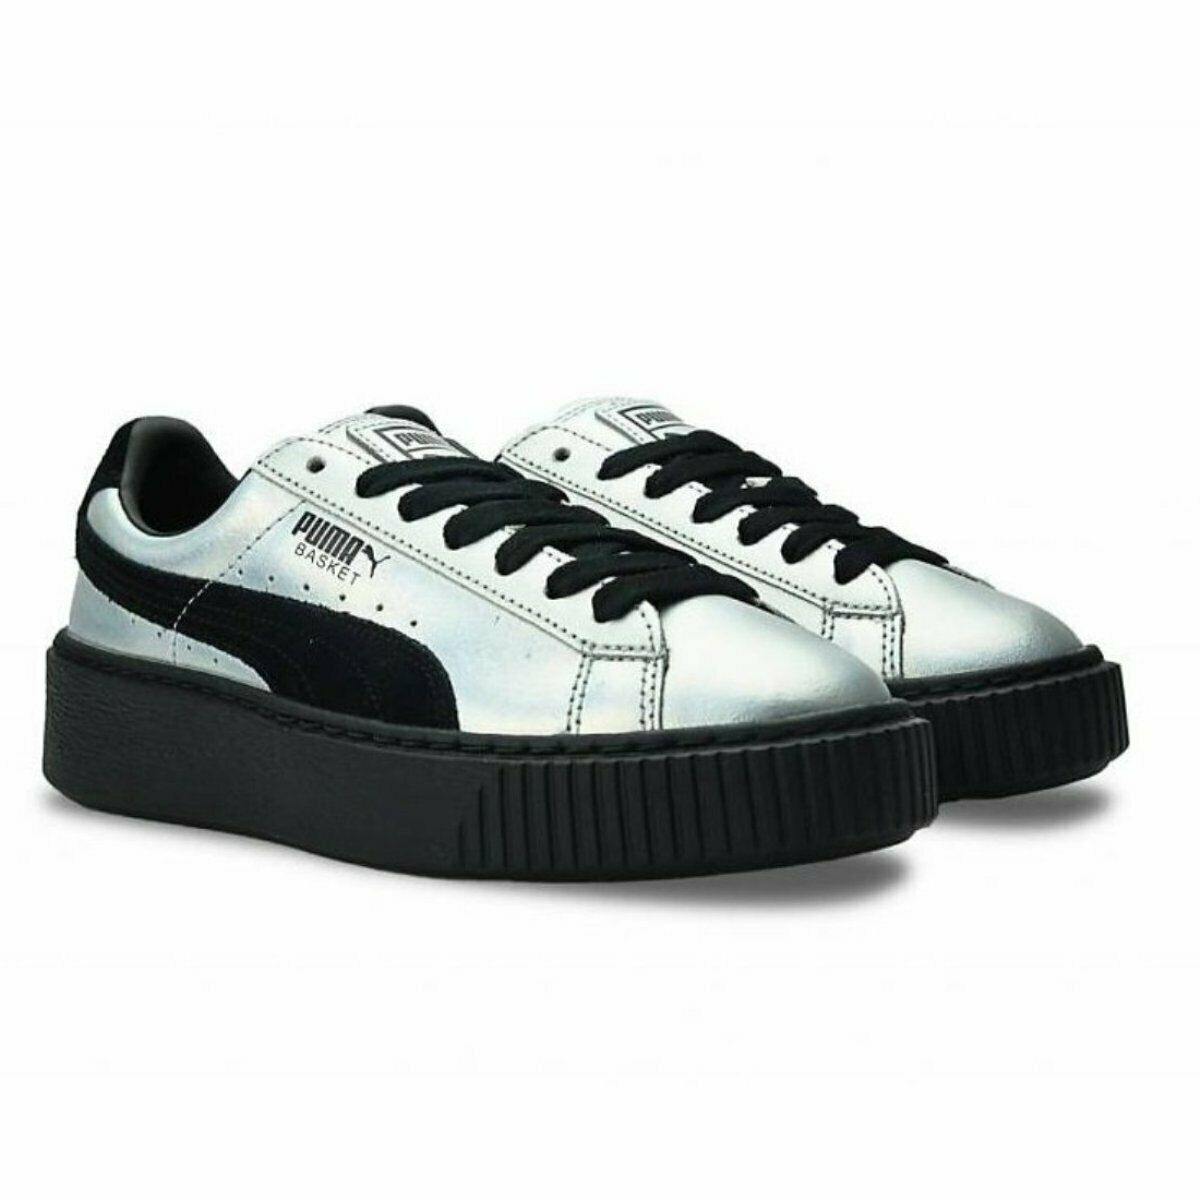 PUMA PLATFORM Explosive Wn's scarpe da ginnastica donna Pelle e suede argentoo-Nero  120